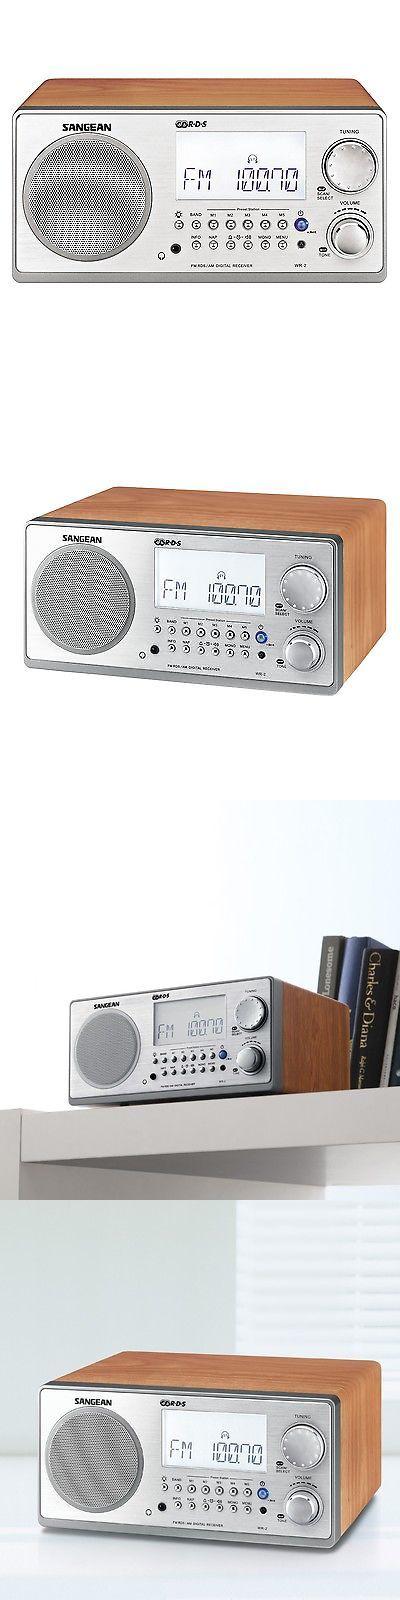 Portable AM FM Radios: Sangean Wr-2 Fm-Rbds Am Wooden Cabinet Digital Tuning Radio Receiver In Walnut -> BUY IT NOW ONLY: $116.76 on eBay!